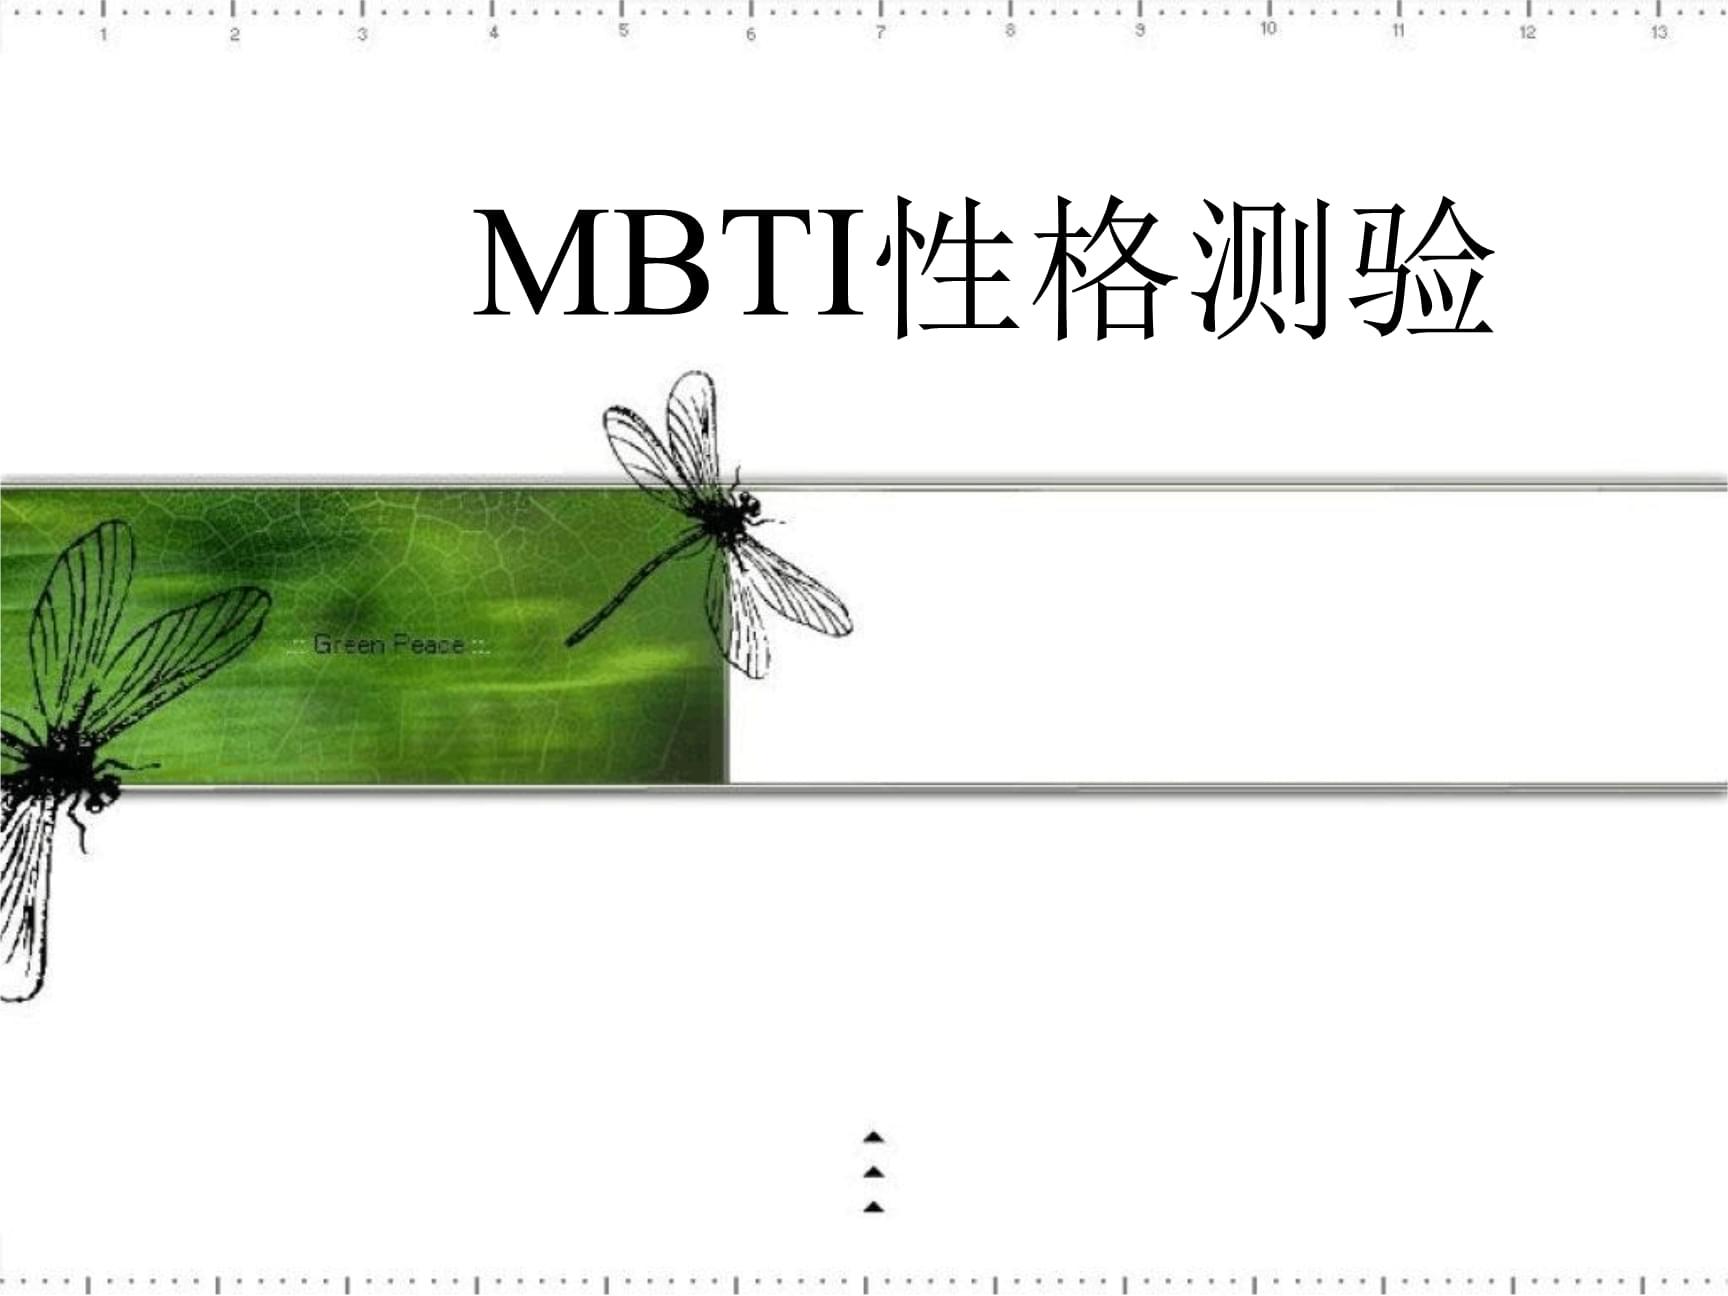 MBTI性格理论剖析.ppt